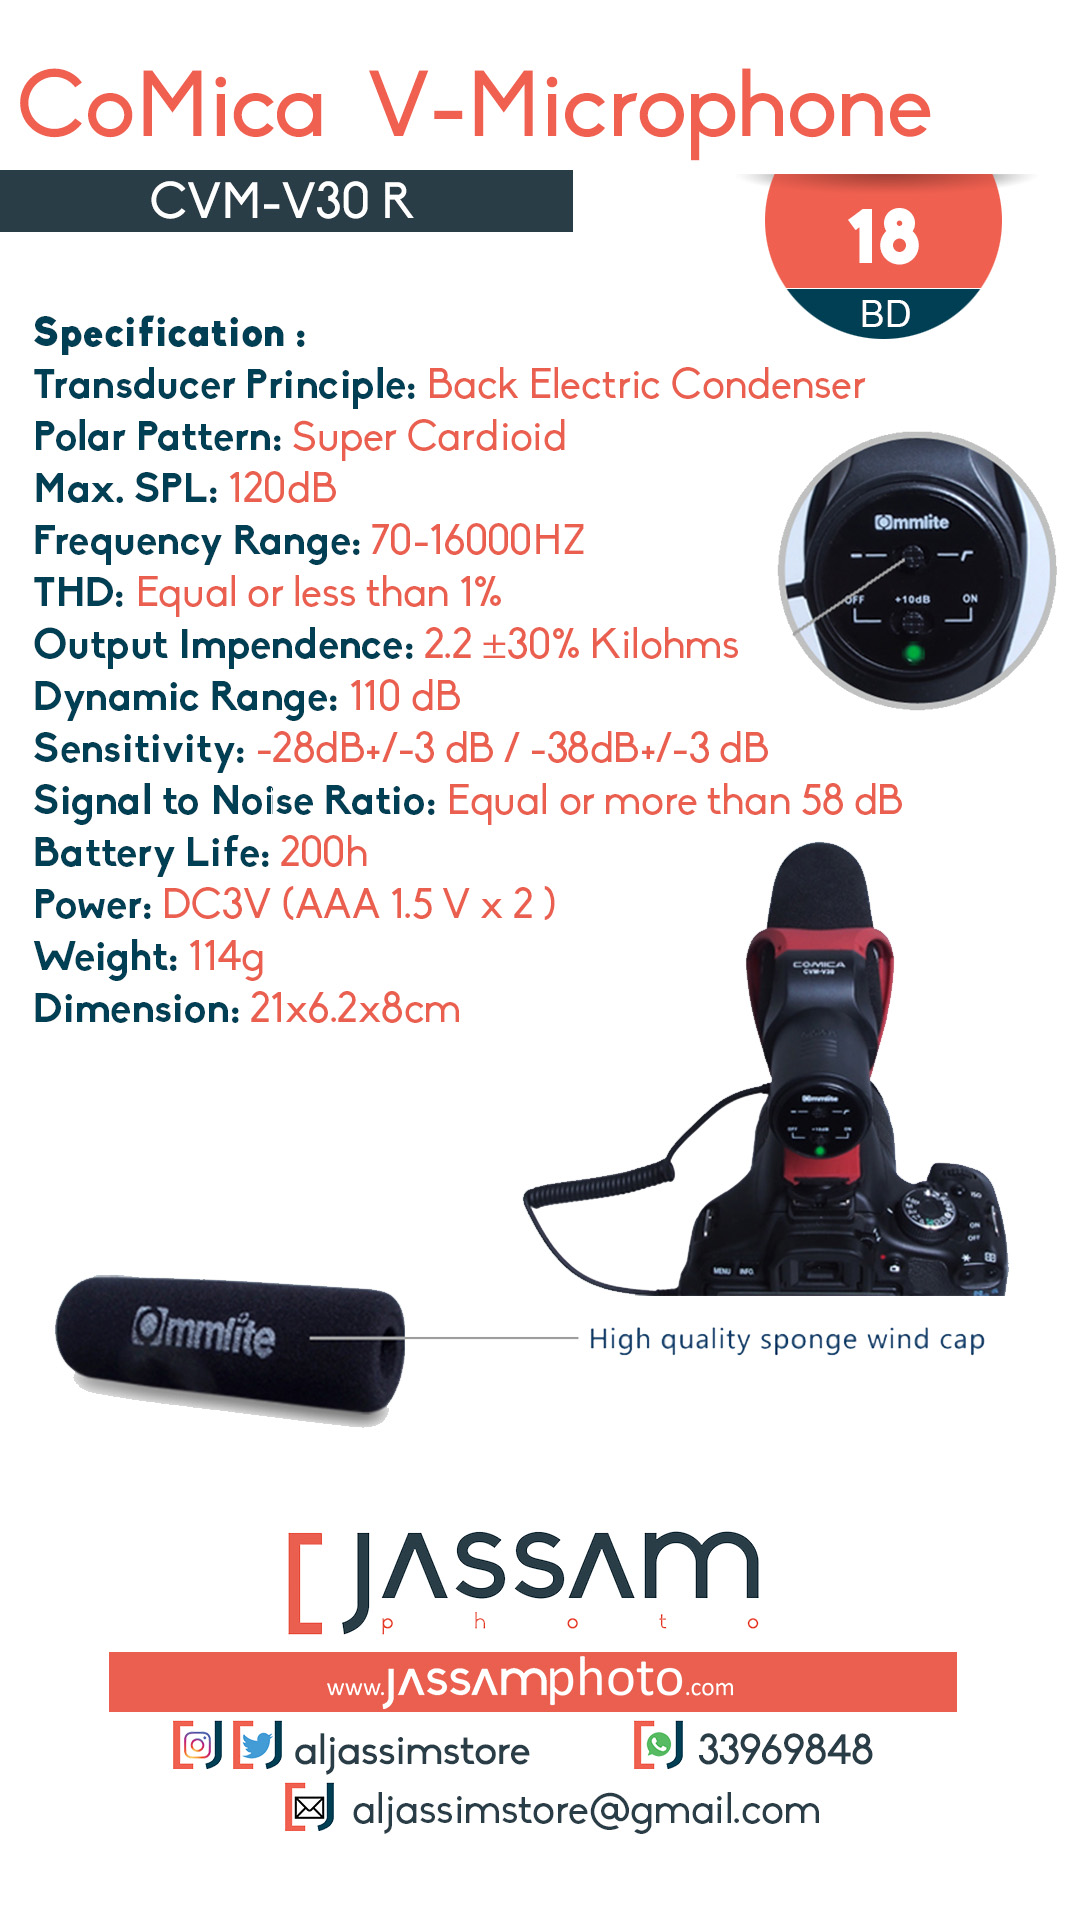 Microphone CVM-V30R